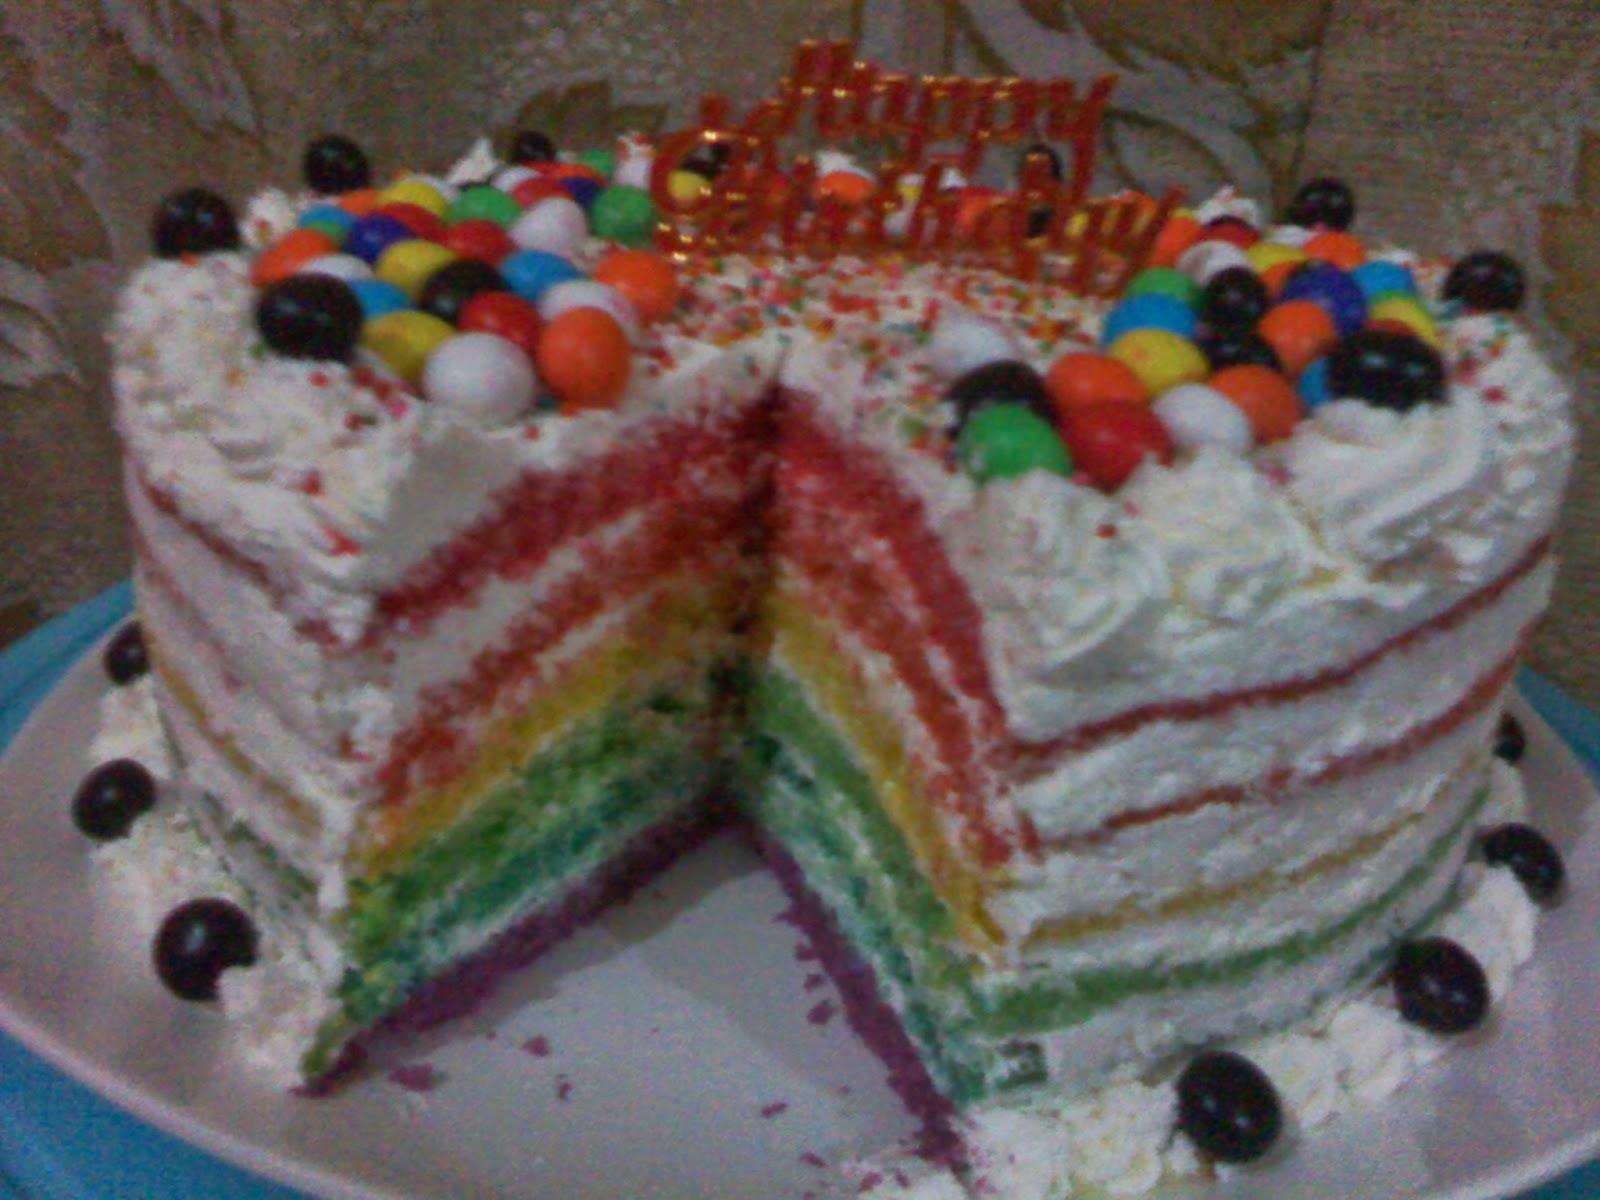 Rainbow cake untuk ulang tahun di padang